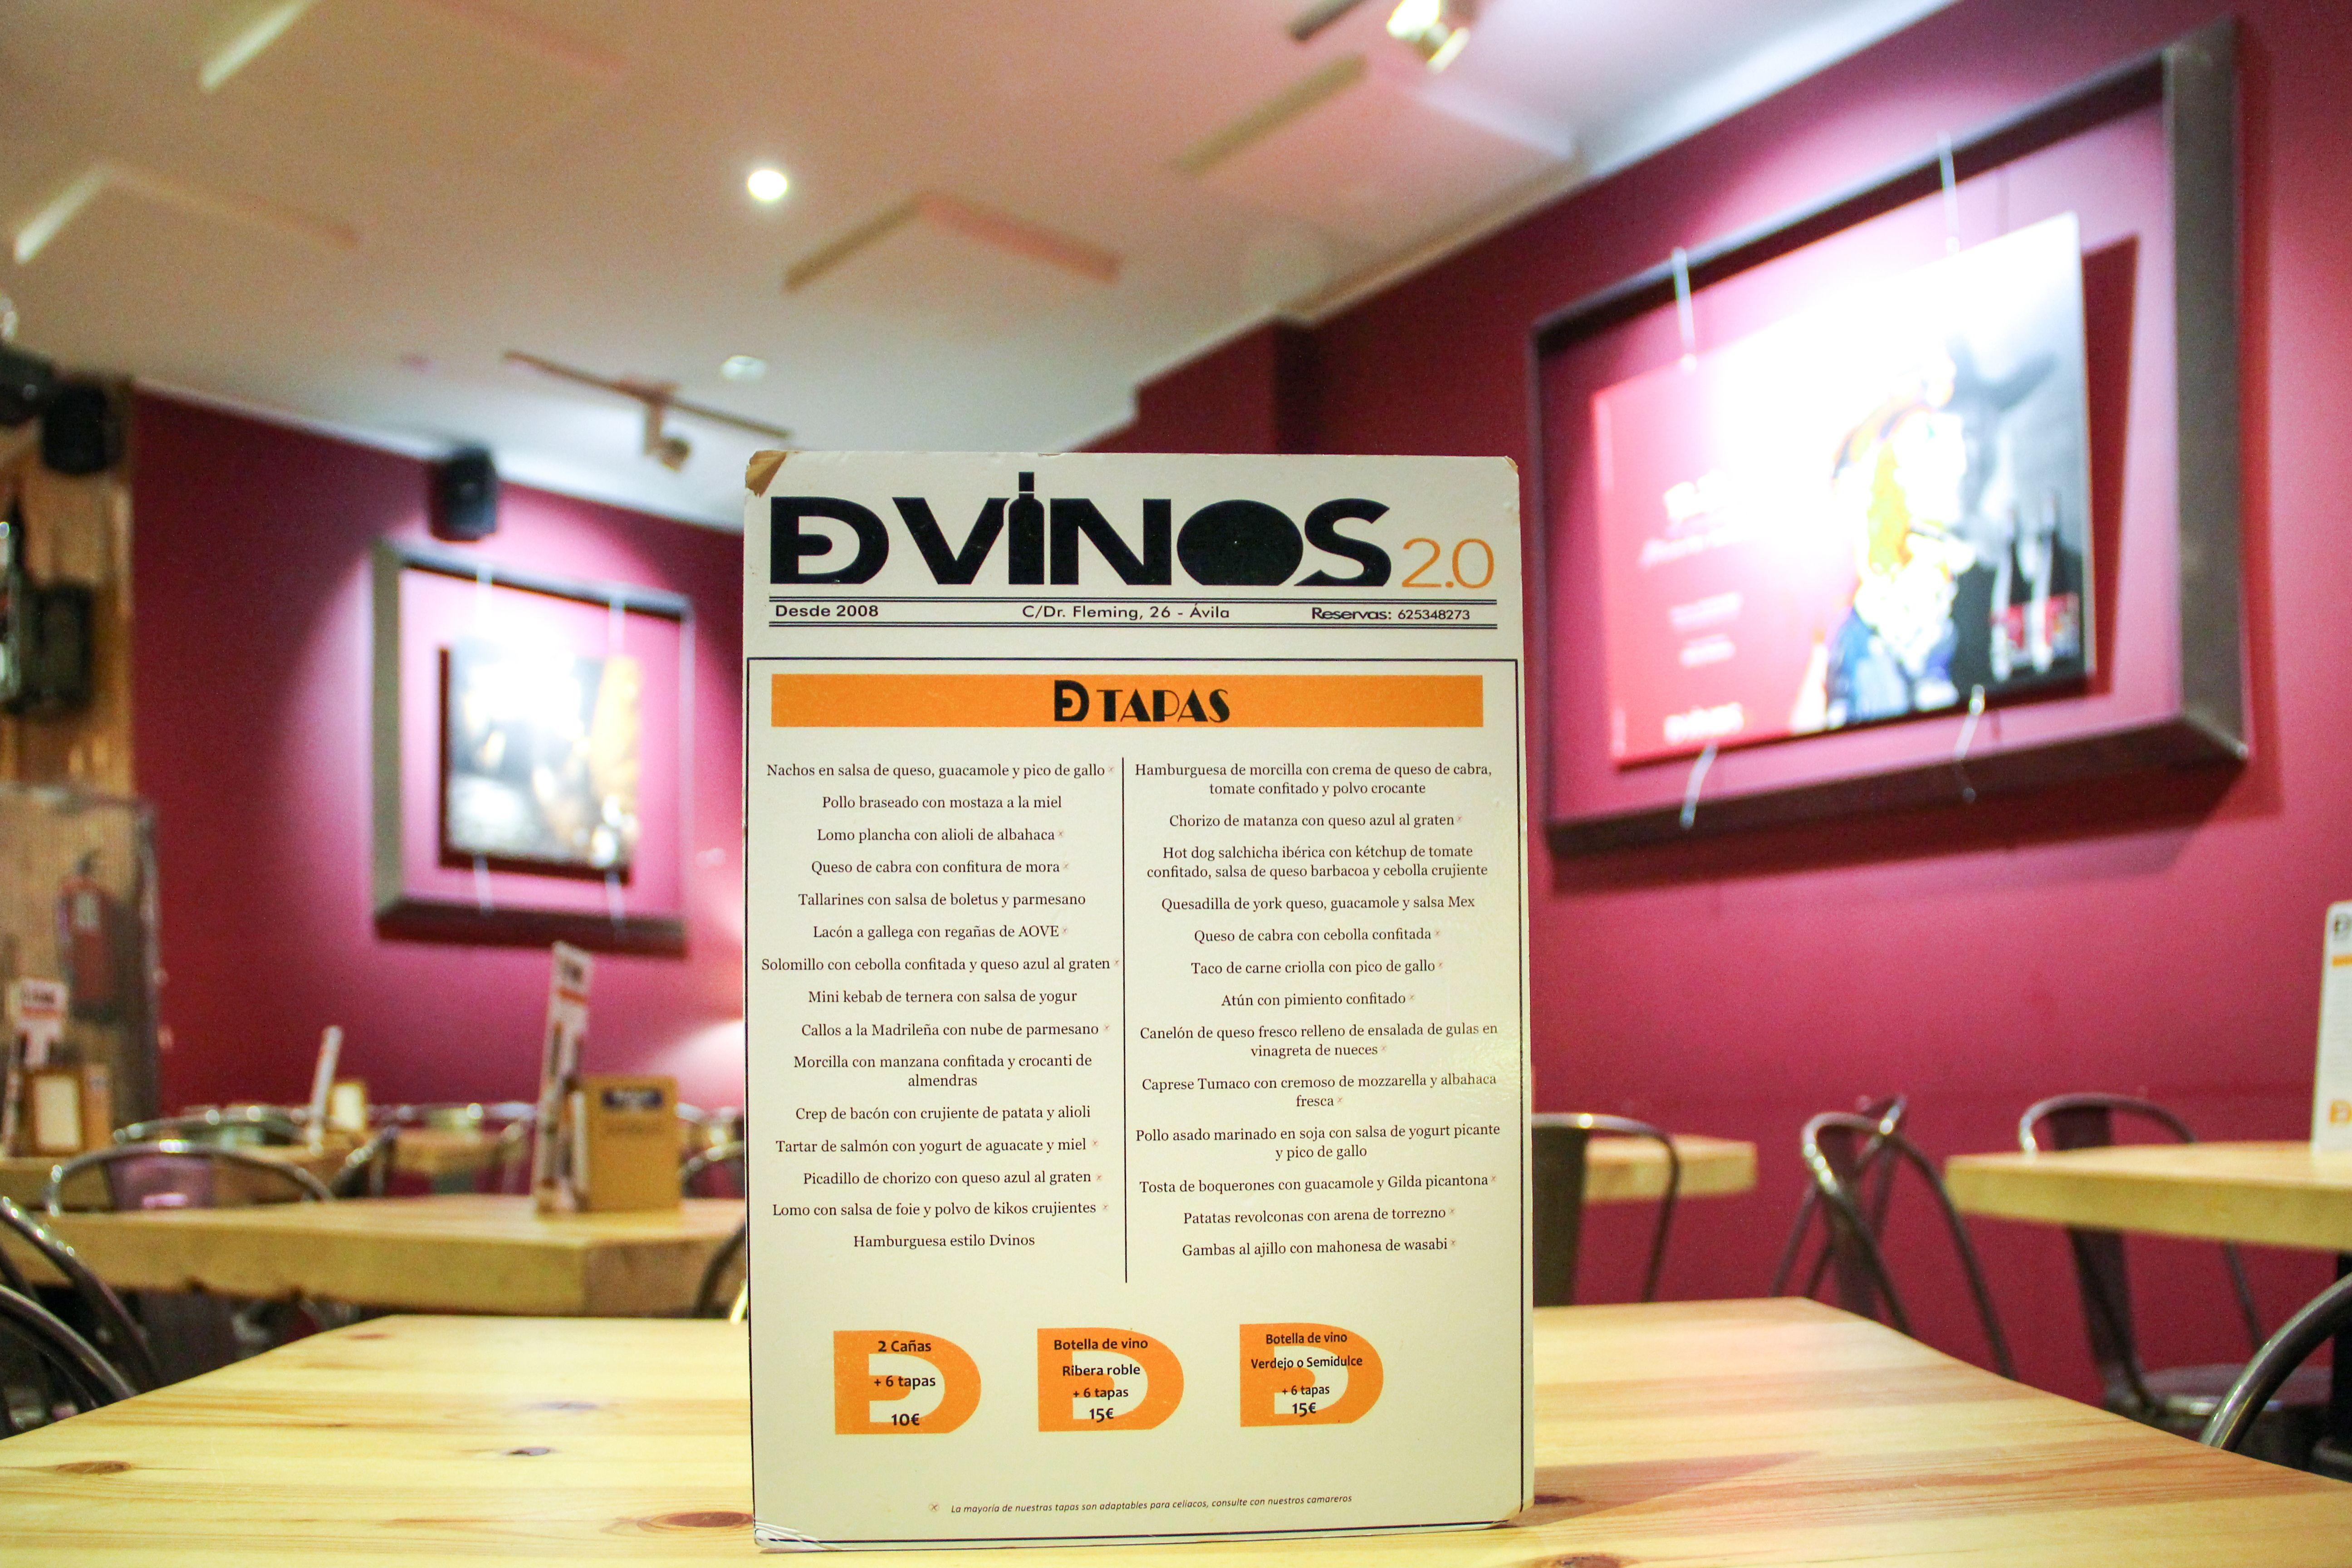 Foto 2 de Bar de tapas en  | Dvinos 2.0